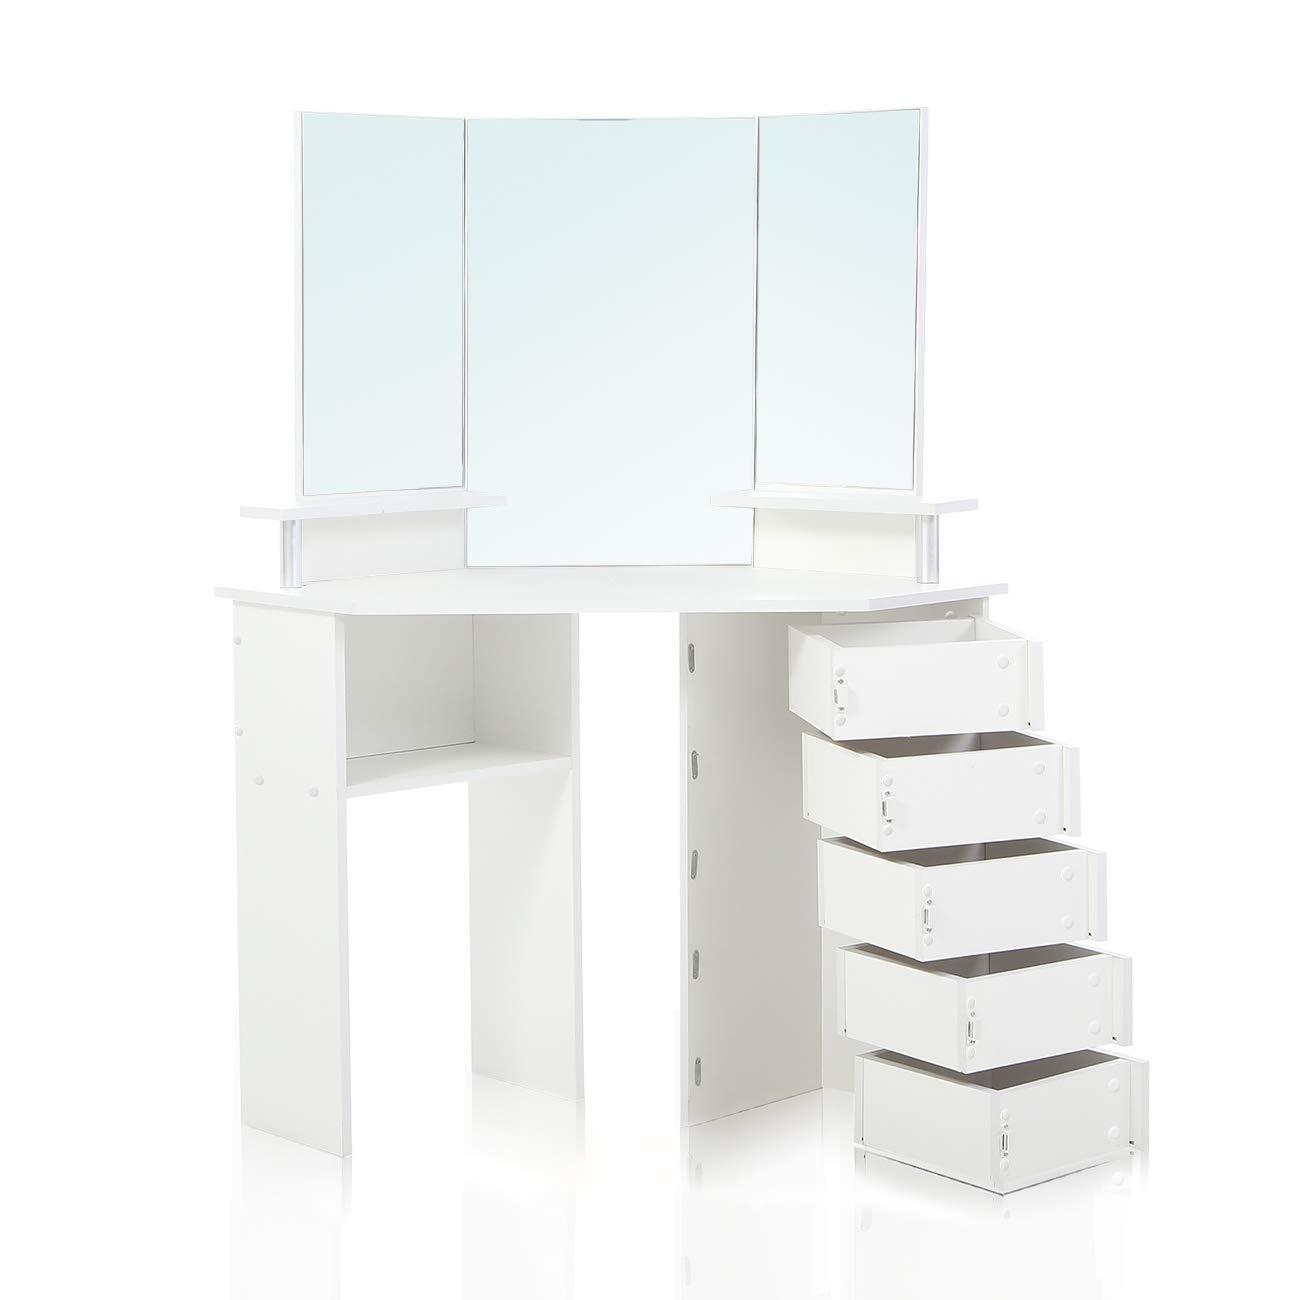 Makika Corner Dressing Table Mirror Set Wooden Vanity 5 Adjustable